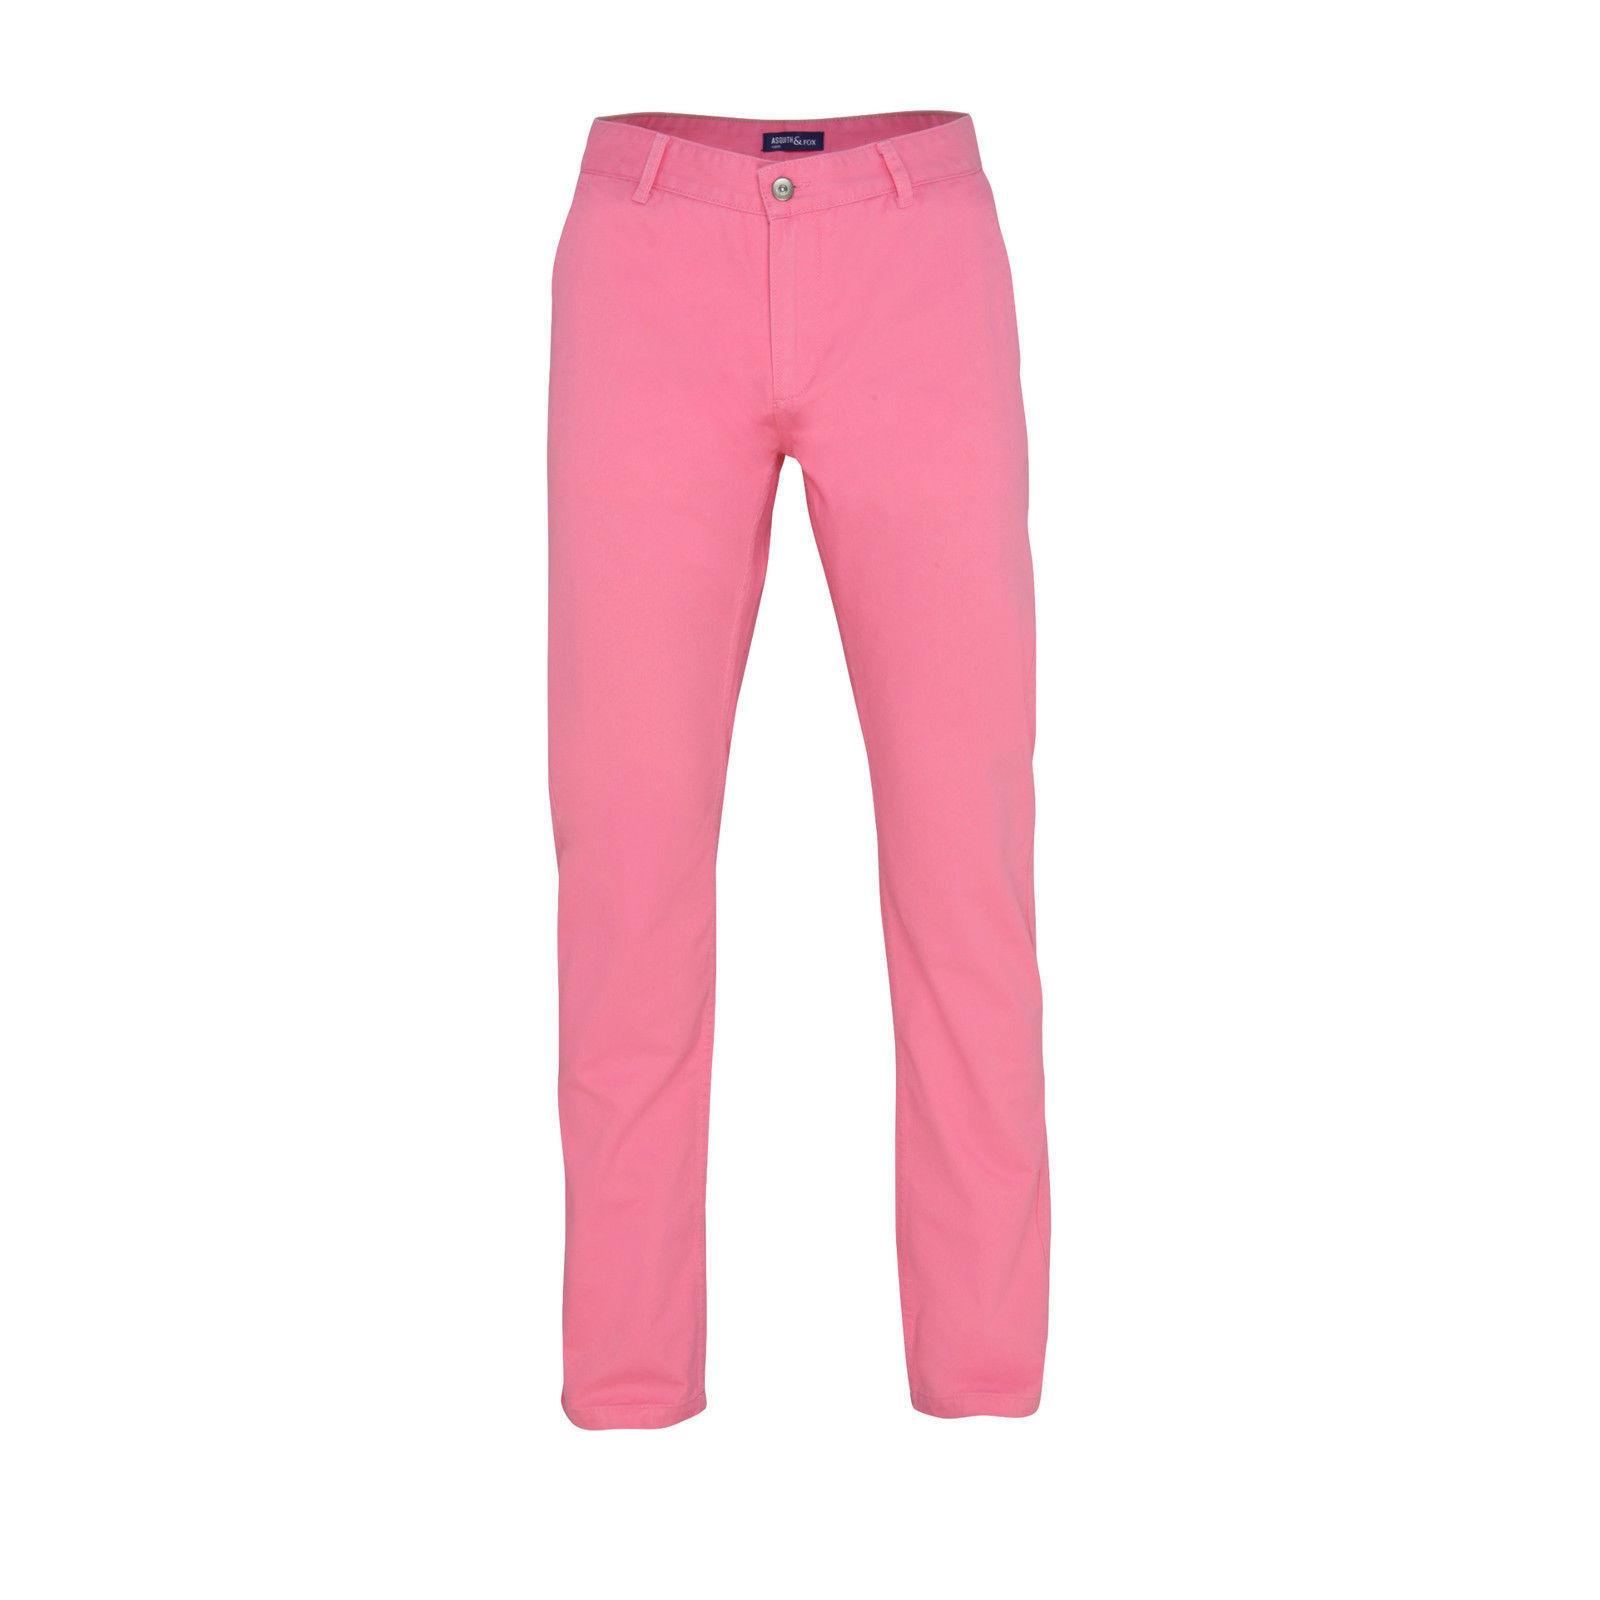 Mens Jeans Sid Pants Pink Trousers Straight Leg Regular Fit Cotton 36W 32L